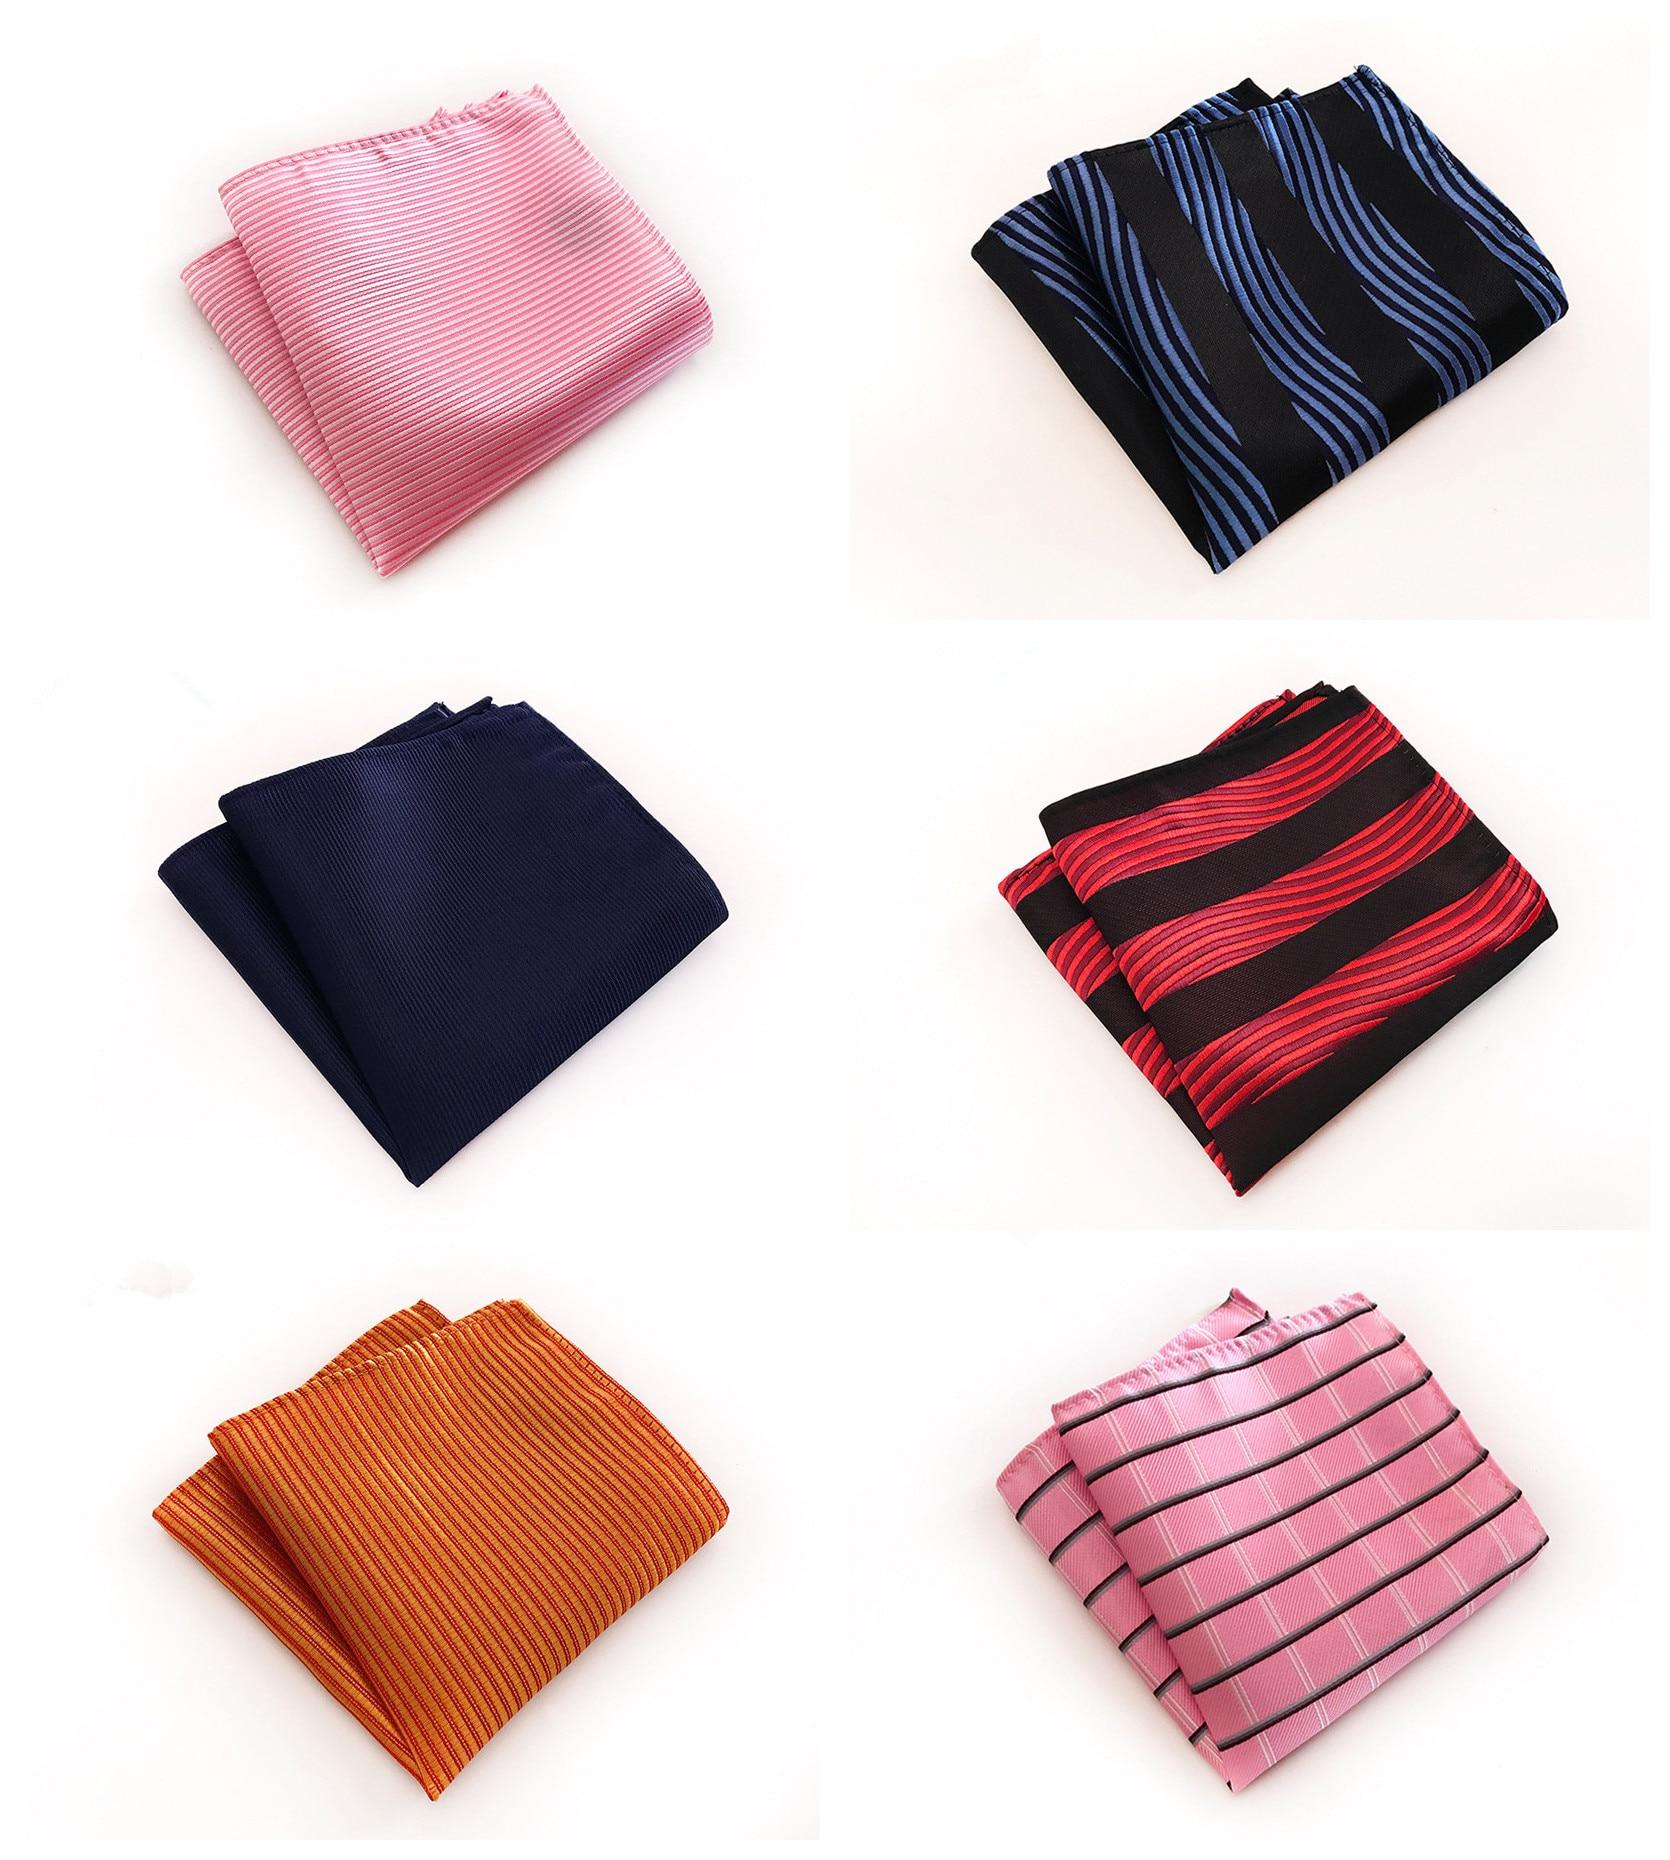 Fashion Silk Flower Business Pocket Towel Handkerchief Exclusive Original Explosion Models 25x25cm Polyester Pocket Towel